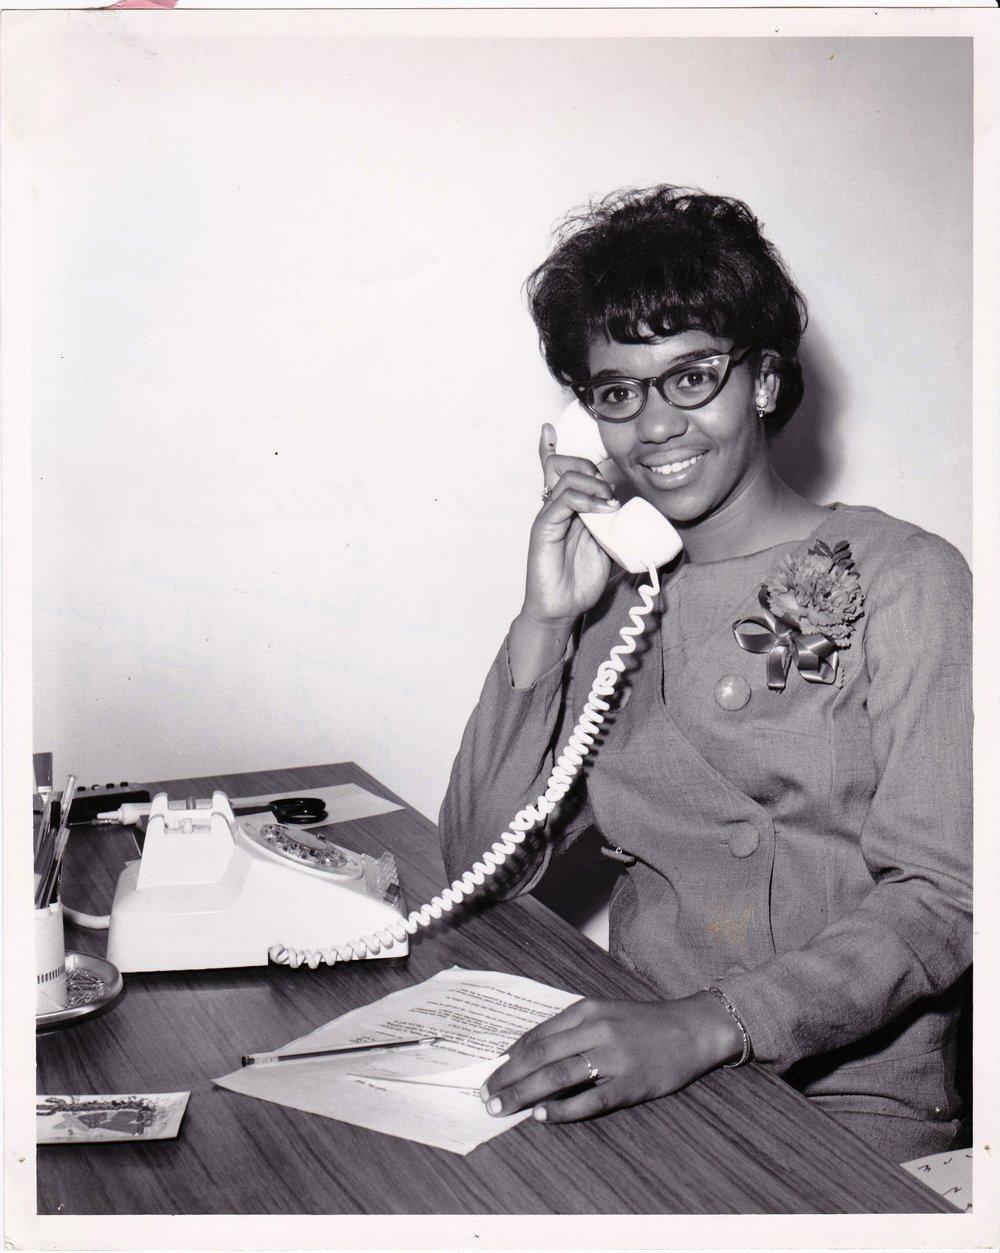 '67 Carol Williams talking to Jeanne Ansel, secretary to Lowe's Hotel President, NYC